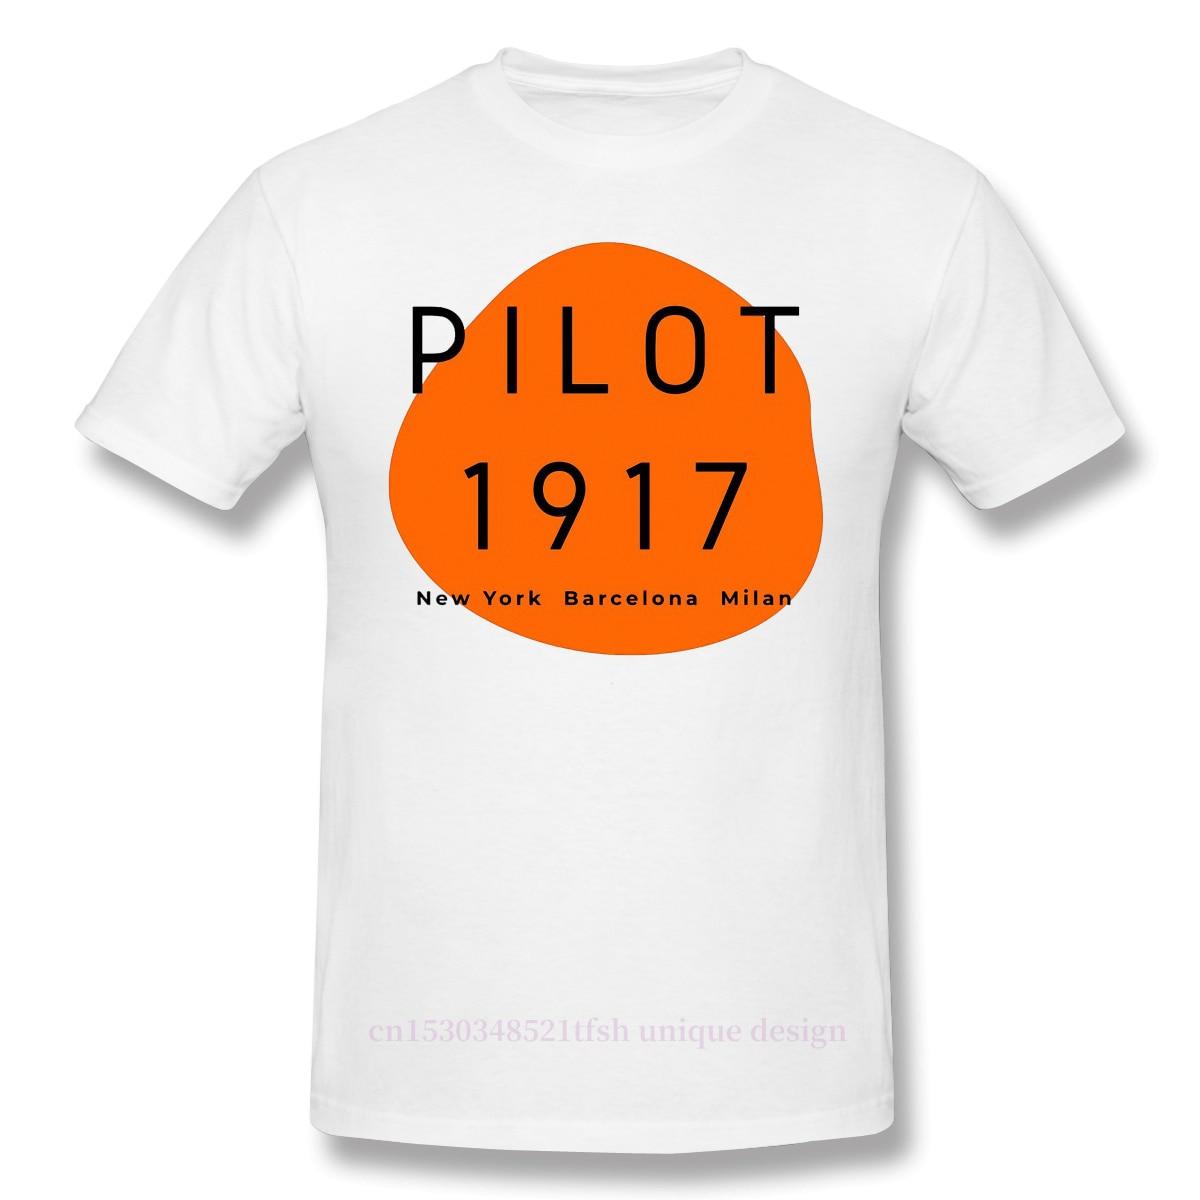 Piloto estampado naranja Camiseta de algodón Camiseta Hombre América guerra aventura 1917...